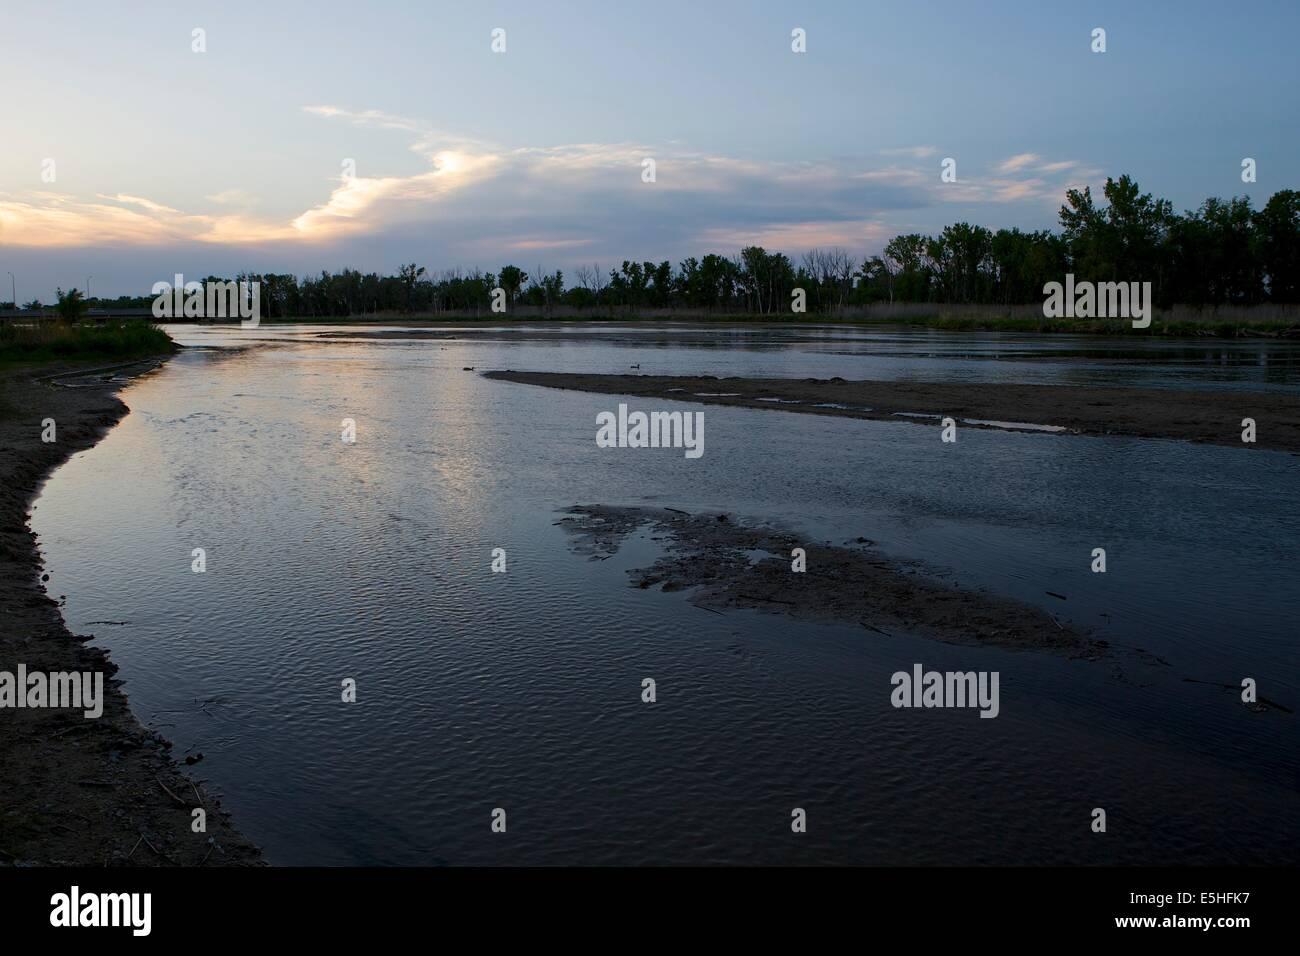 Platte River at sunset in North Platte, Nebraska Stock Photo